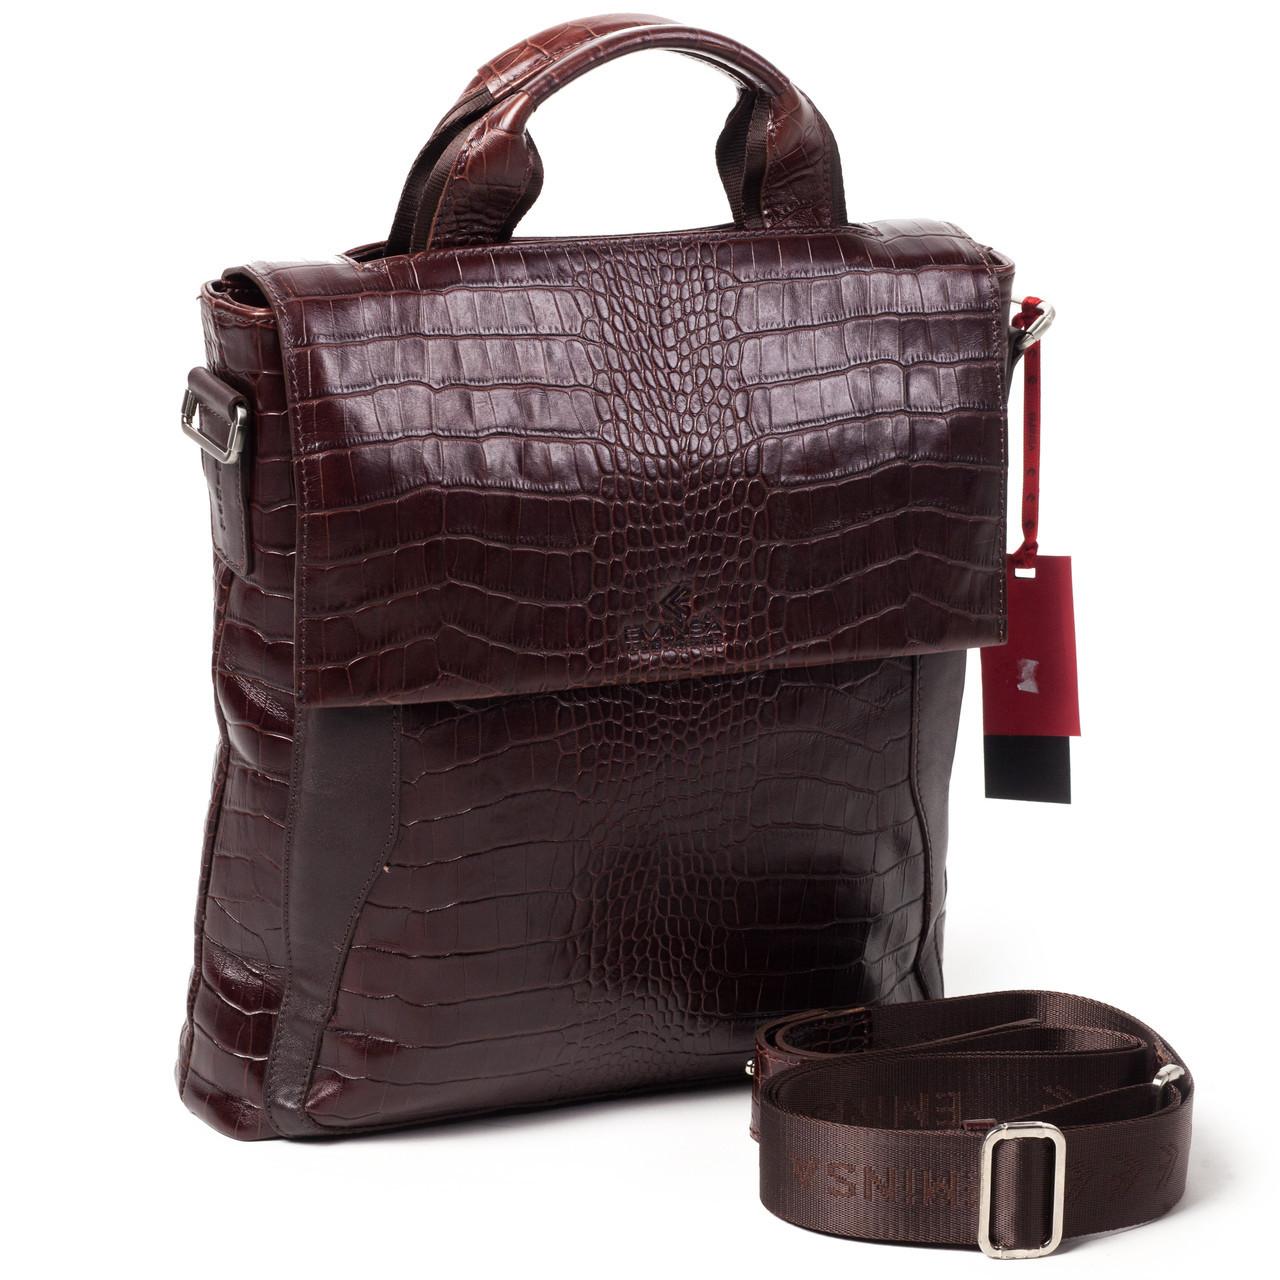 86a5a62eda6a Мужская сумка кожаная коричневая Eminsa 6019-4-3 - АксМаркет в Киеве